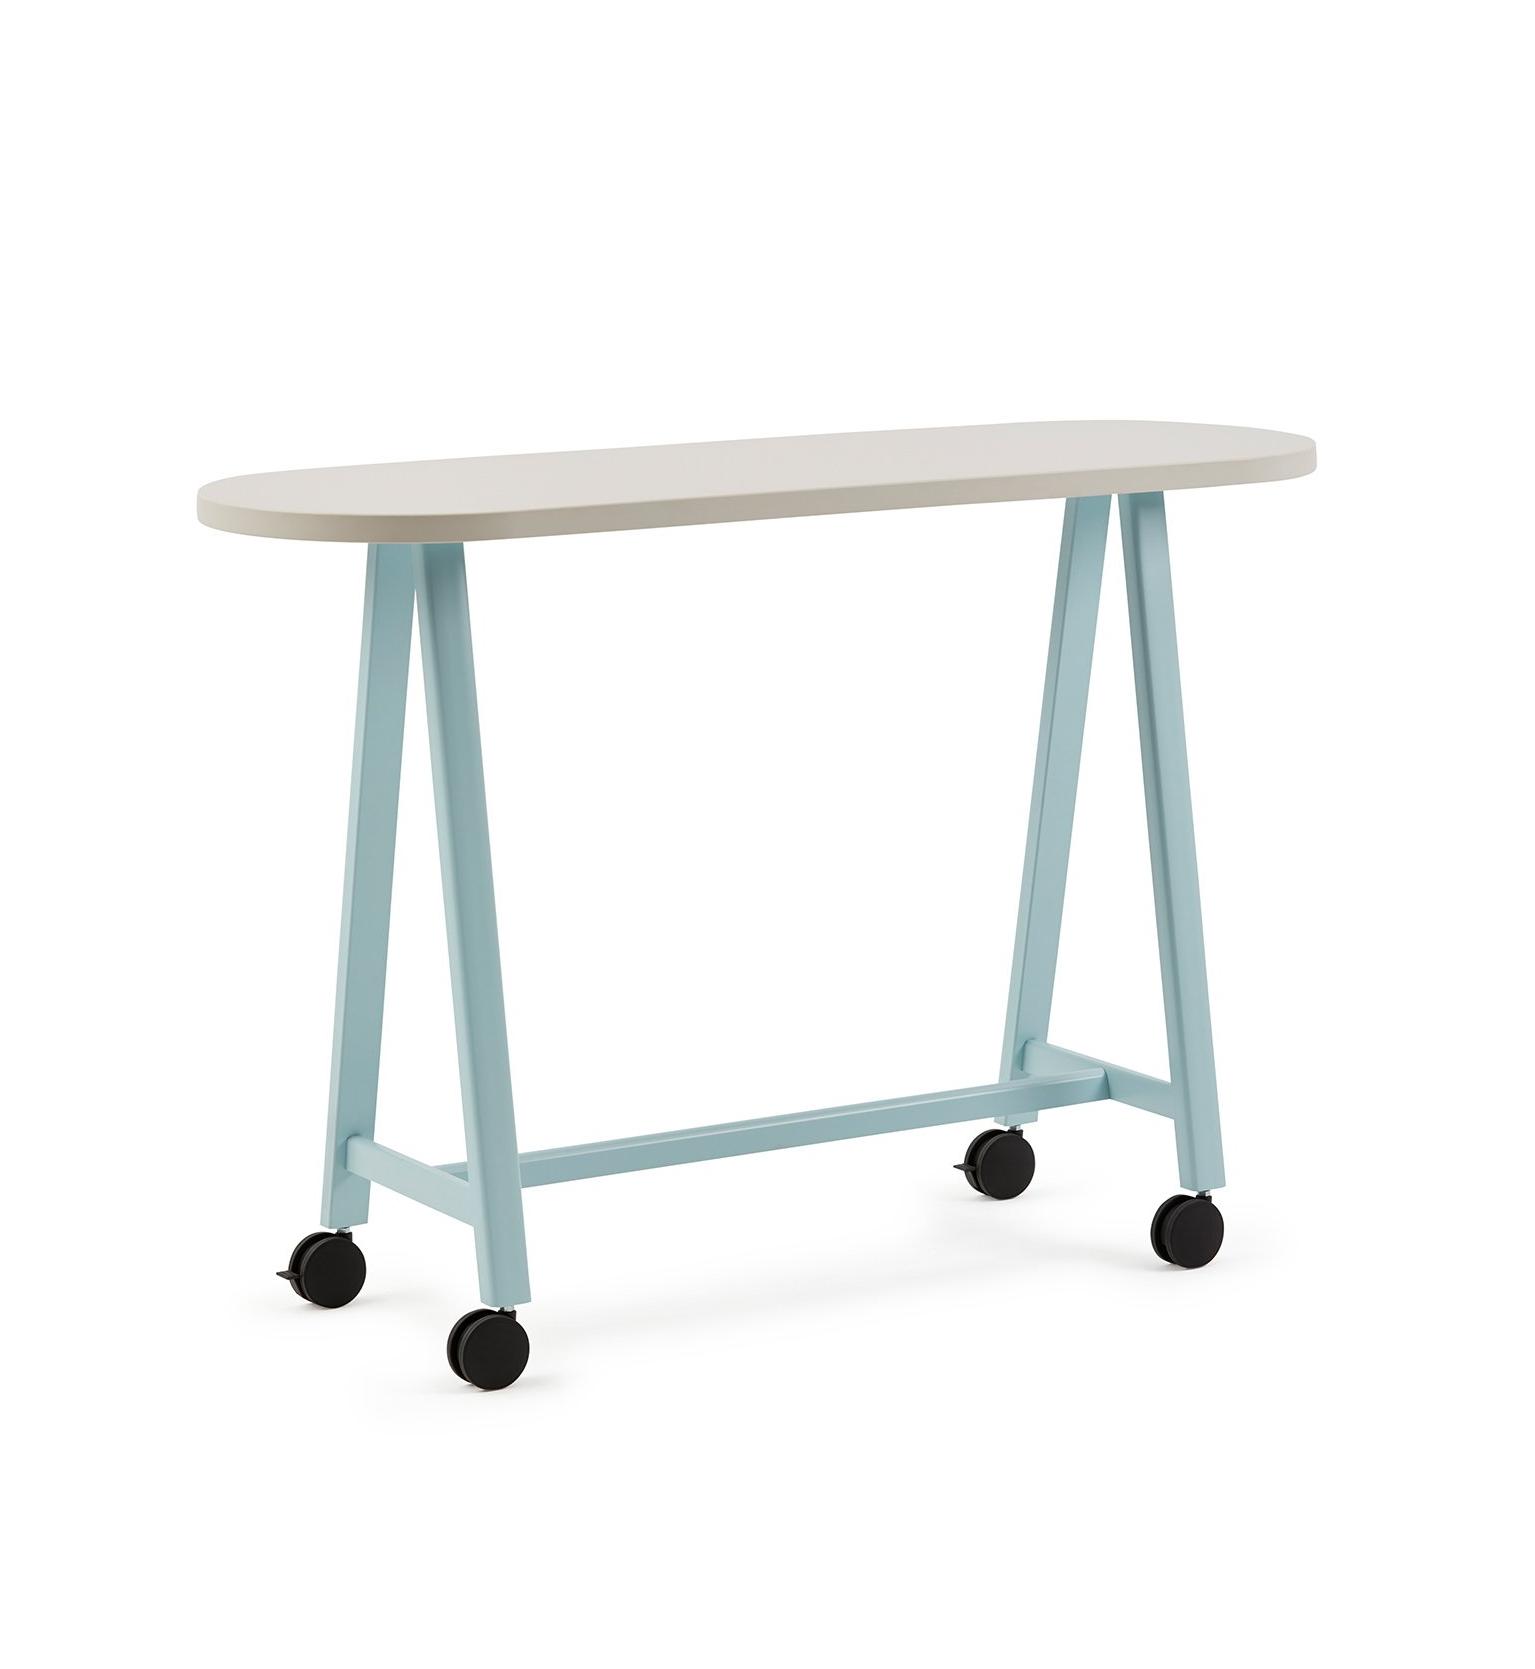 Table: Haworth PopUp